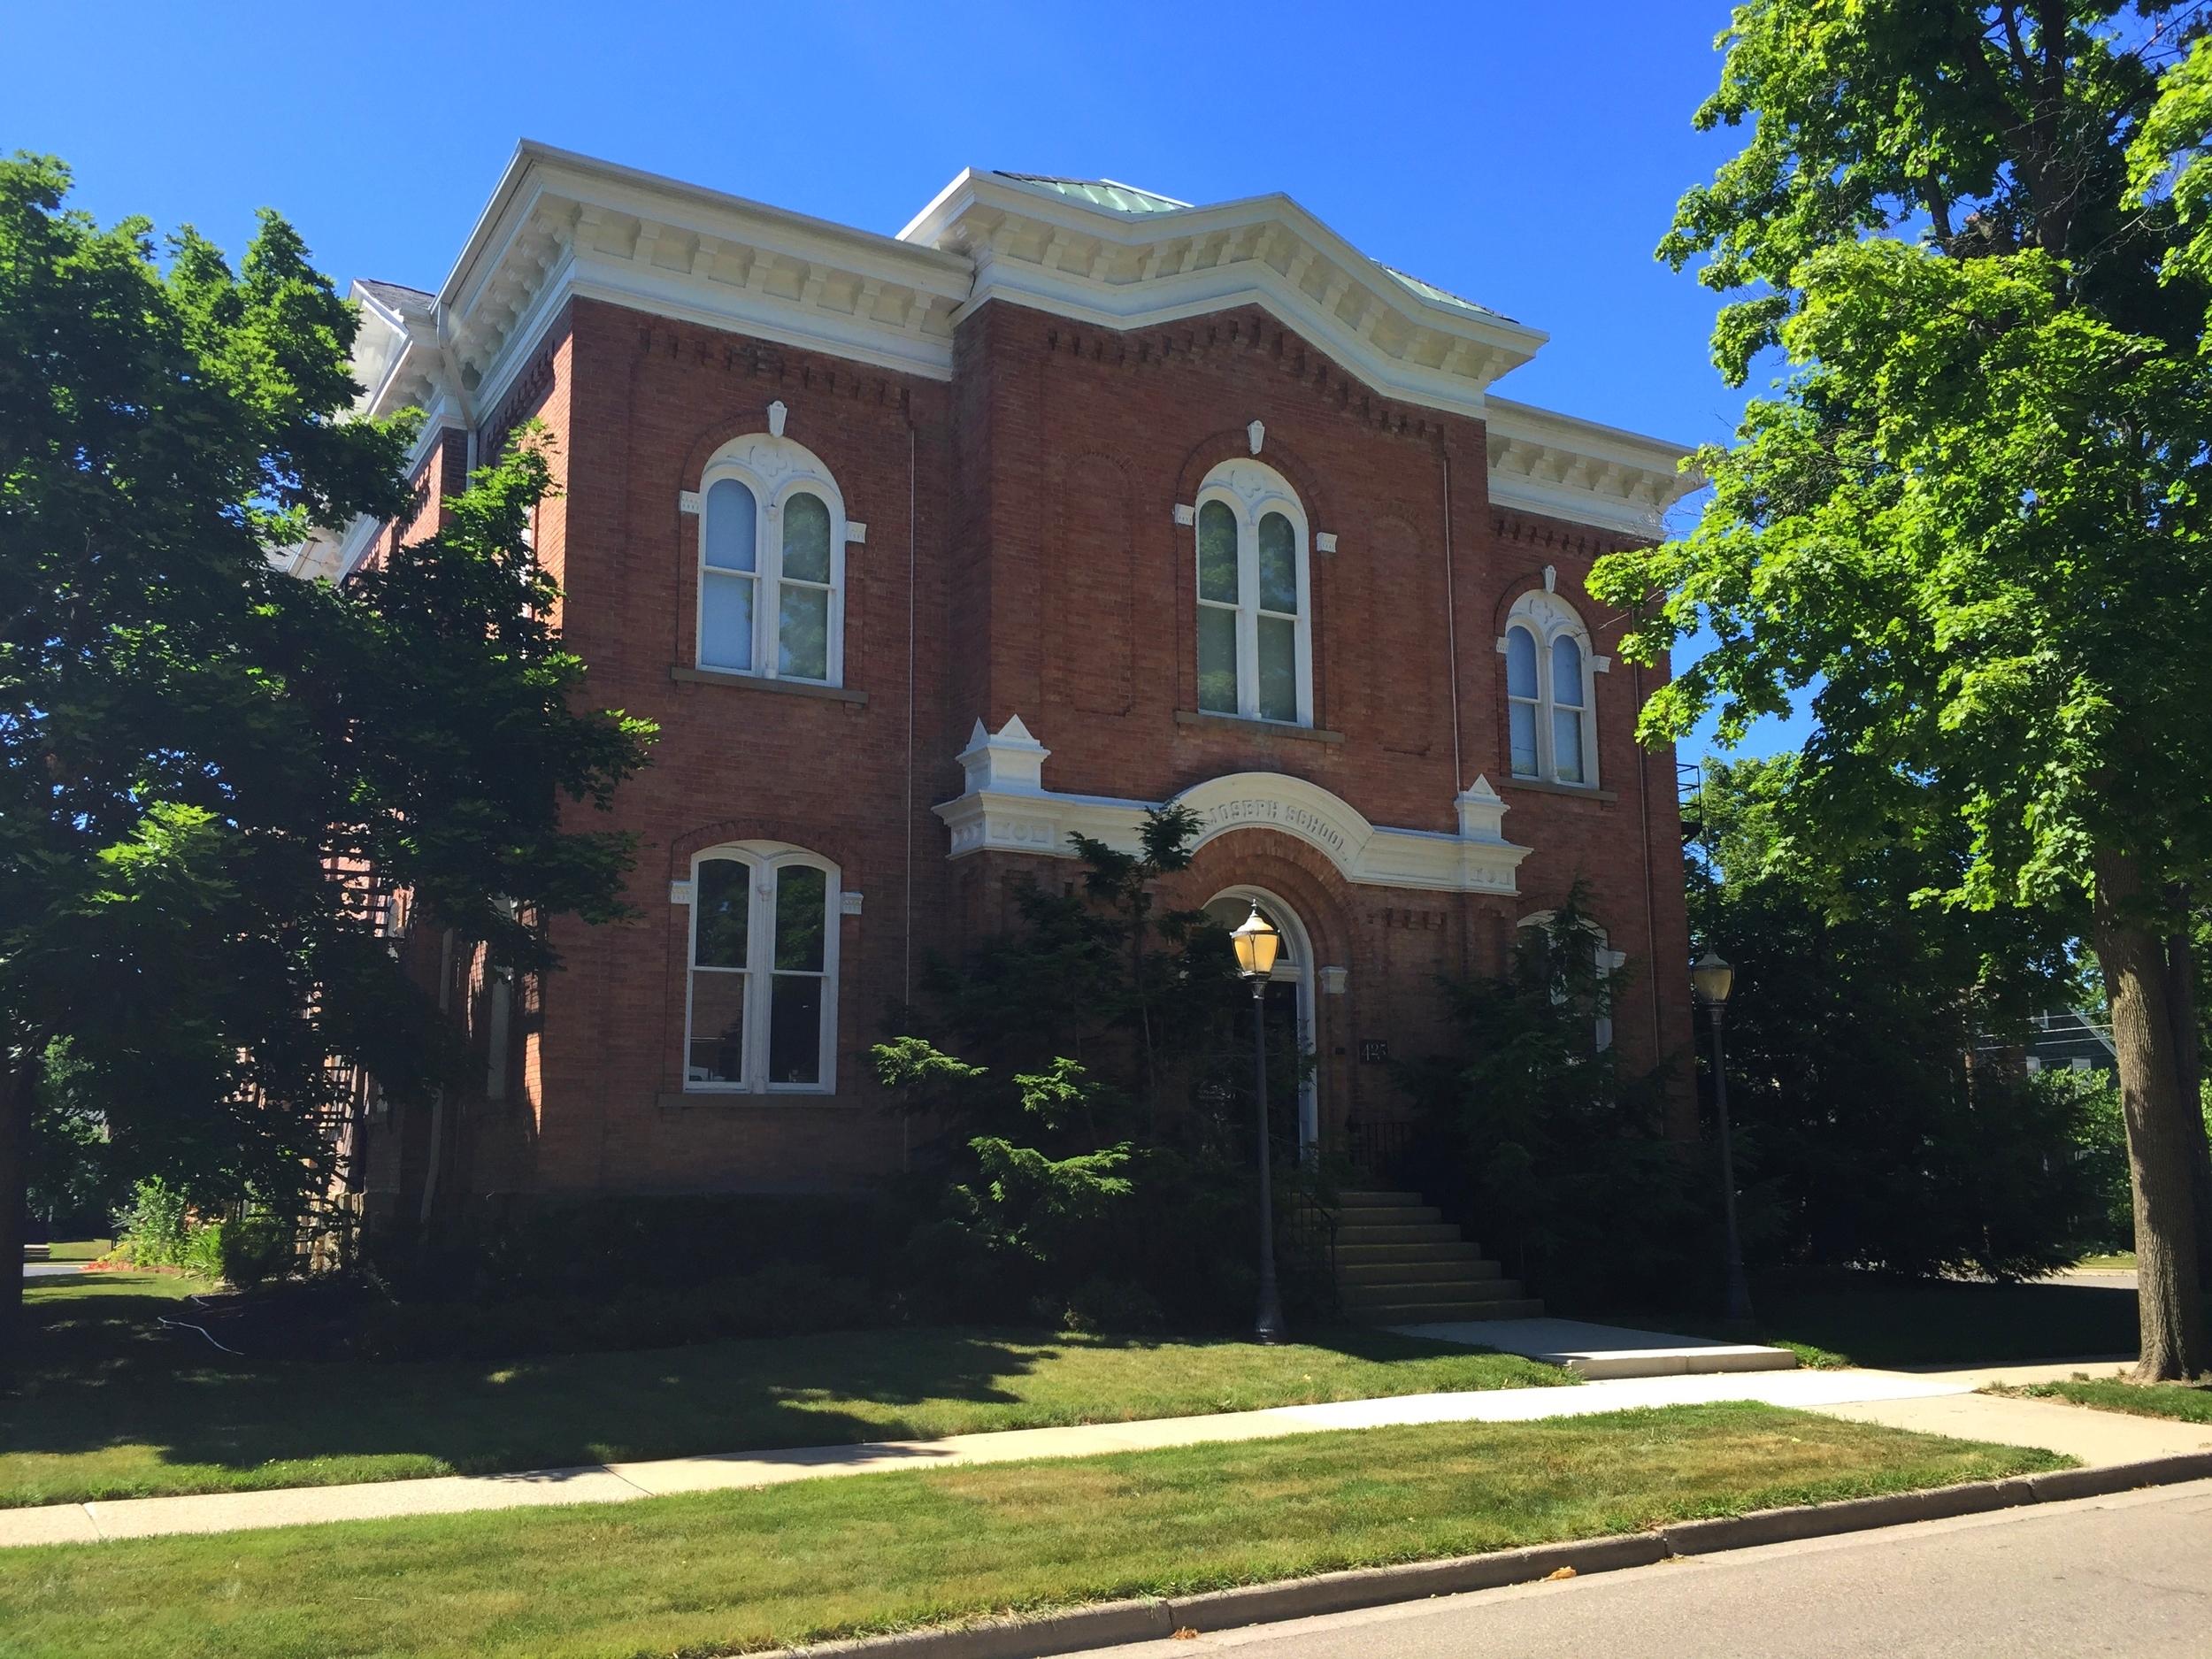 Saint Joseph's School, 417 Ormsby Street, 1884